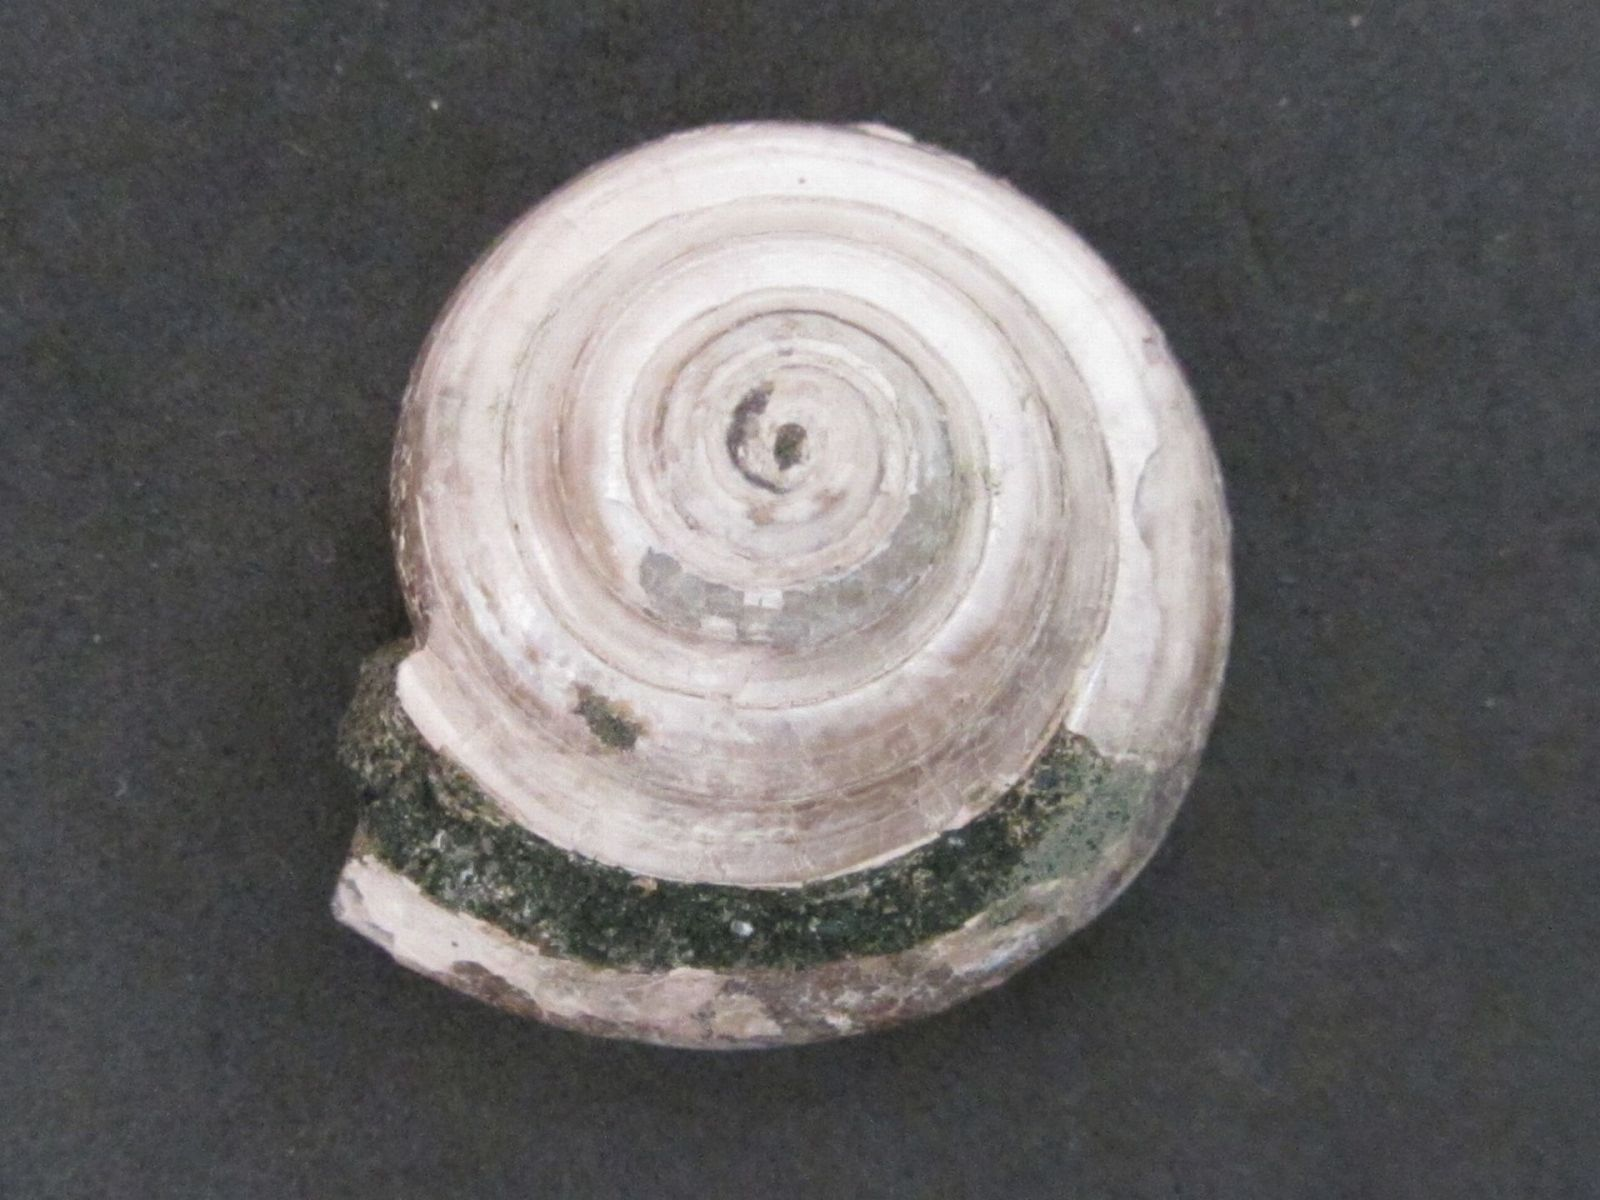 Conotomaria kroisbachensis (Traub)